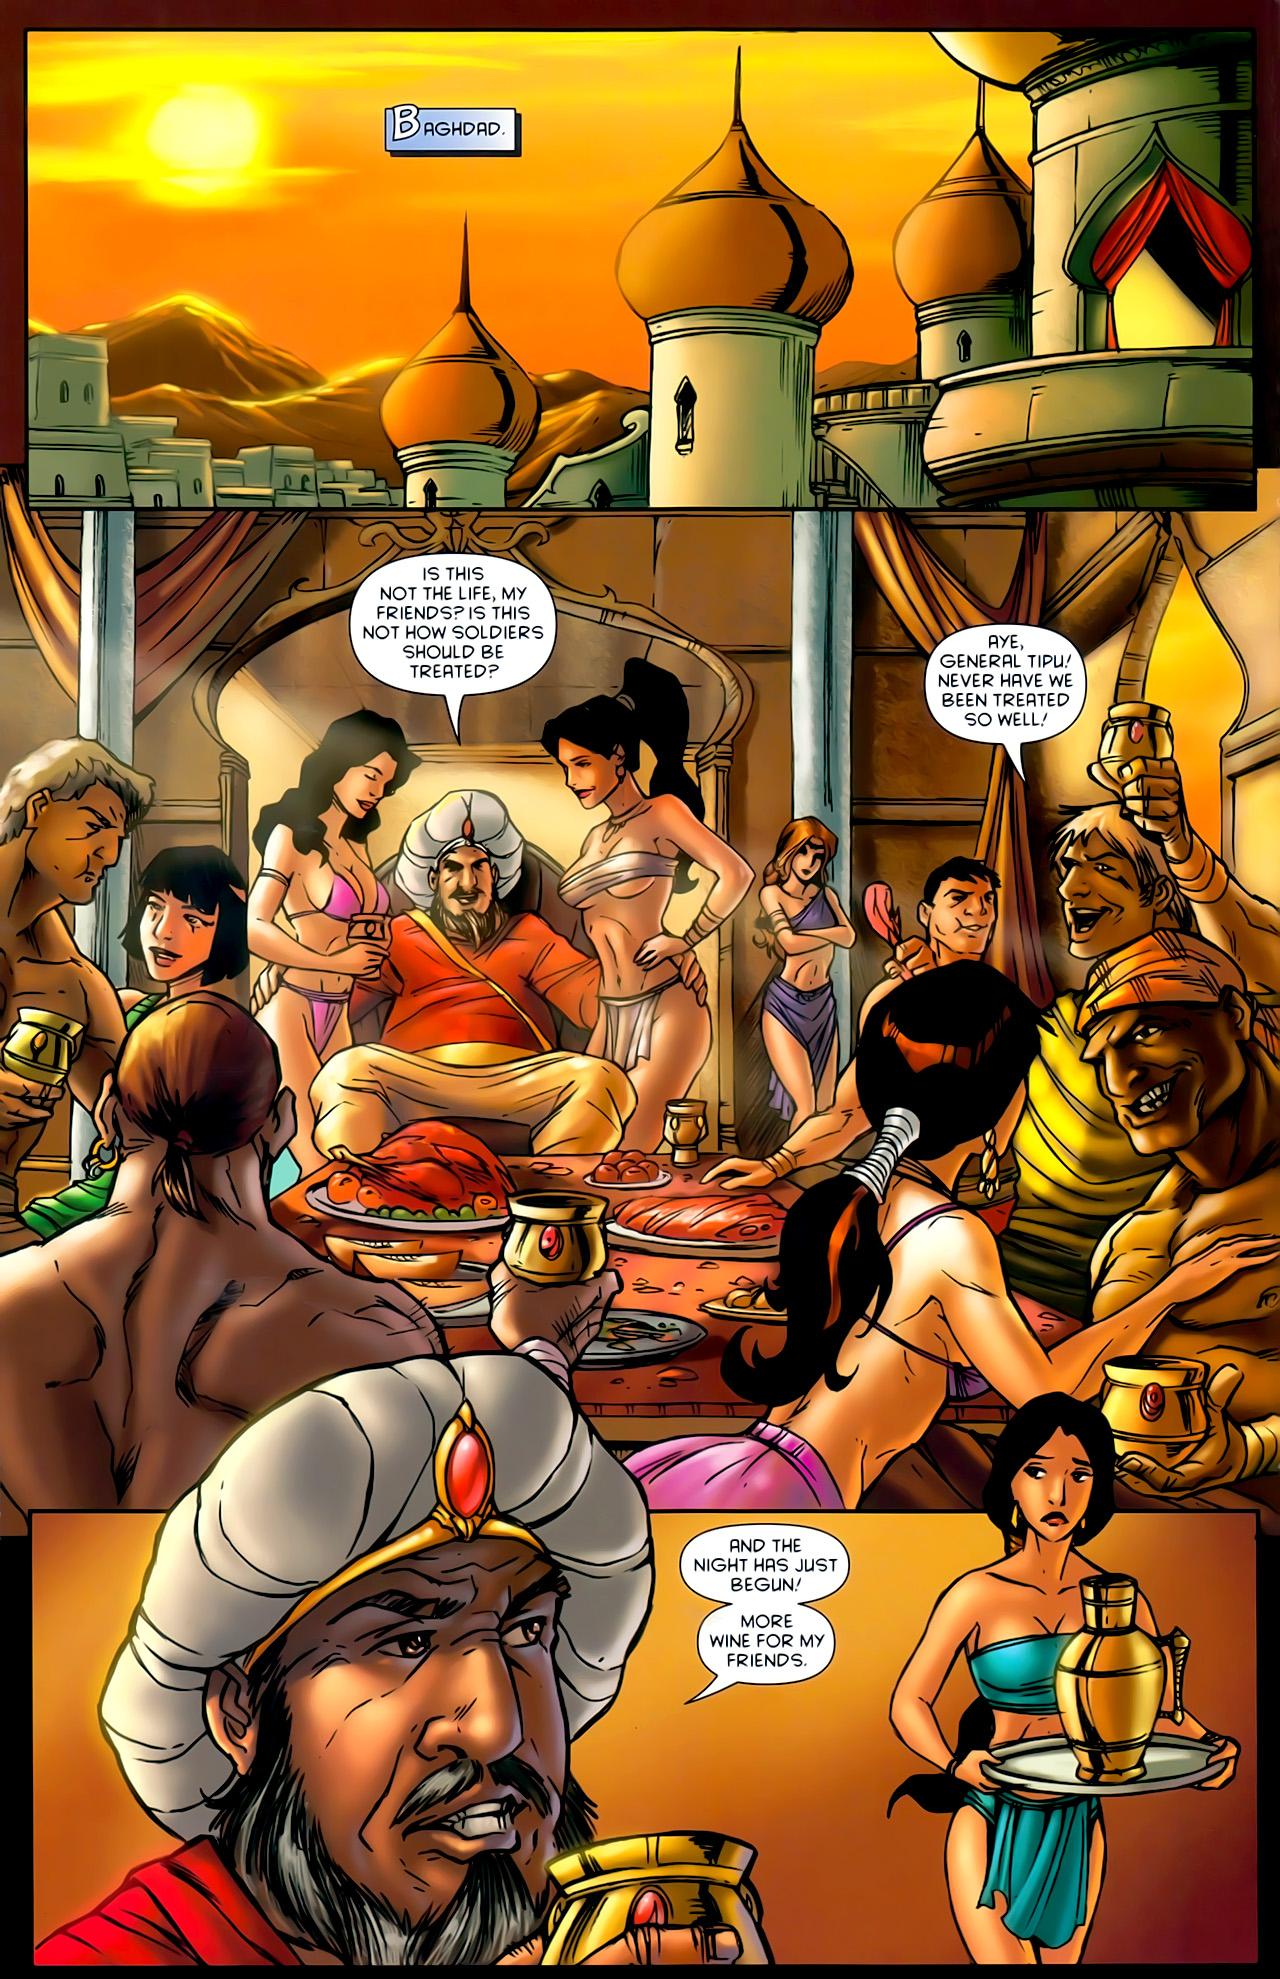 Read online 1001 Arabian Nights: The Adventures of Sinbad comic -  Issue #10 - 12